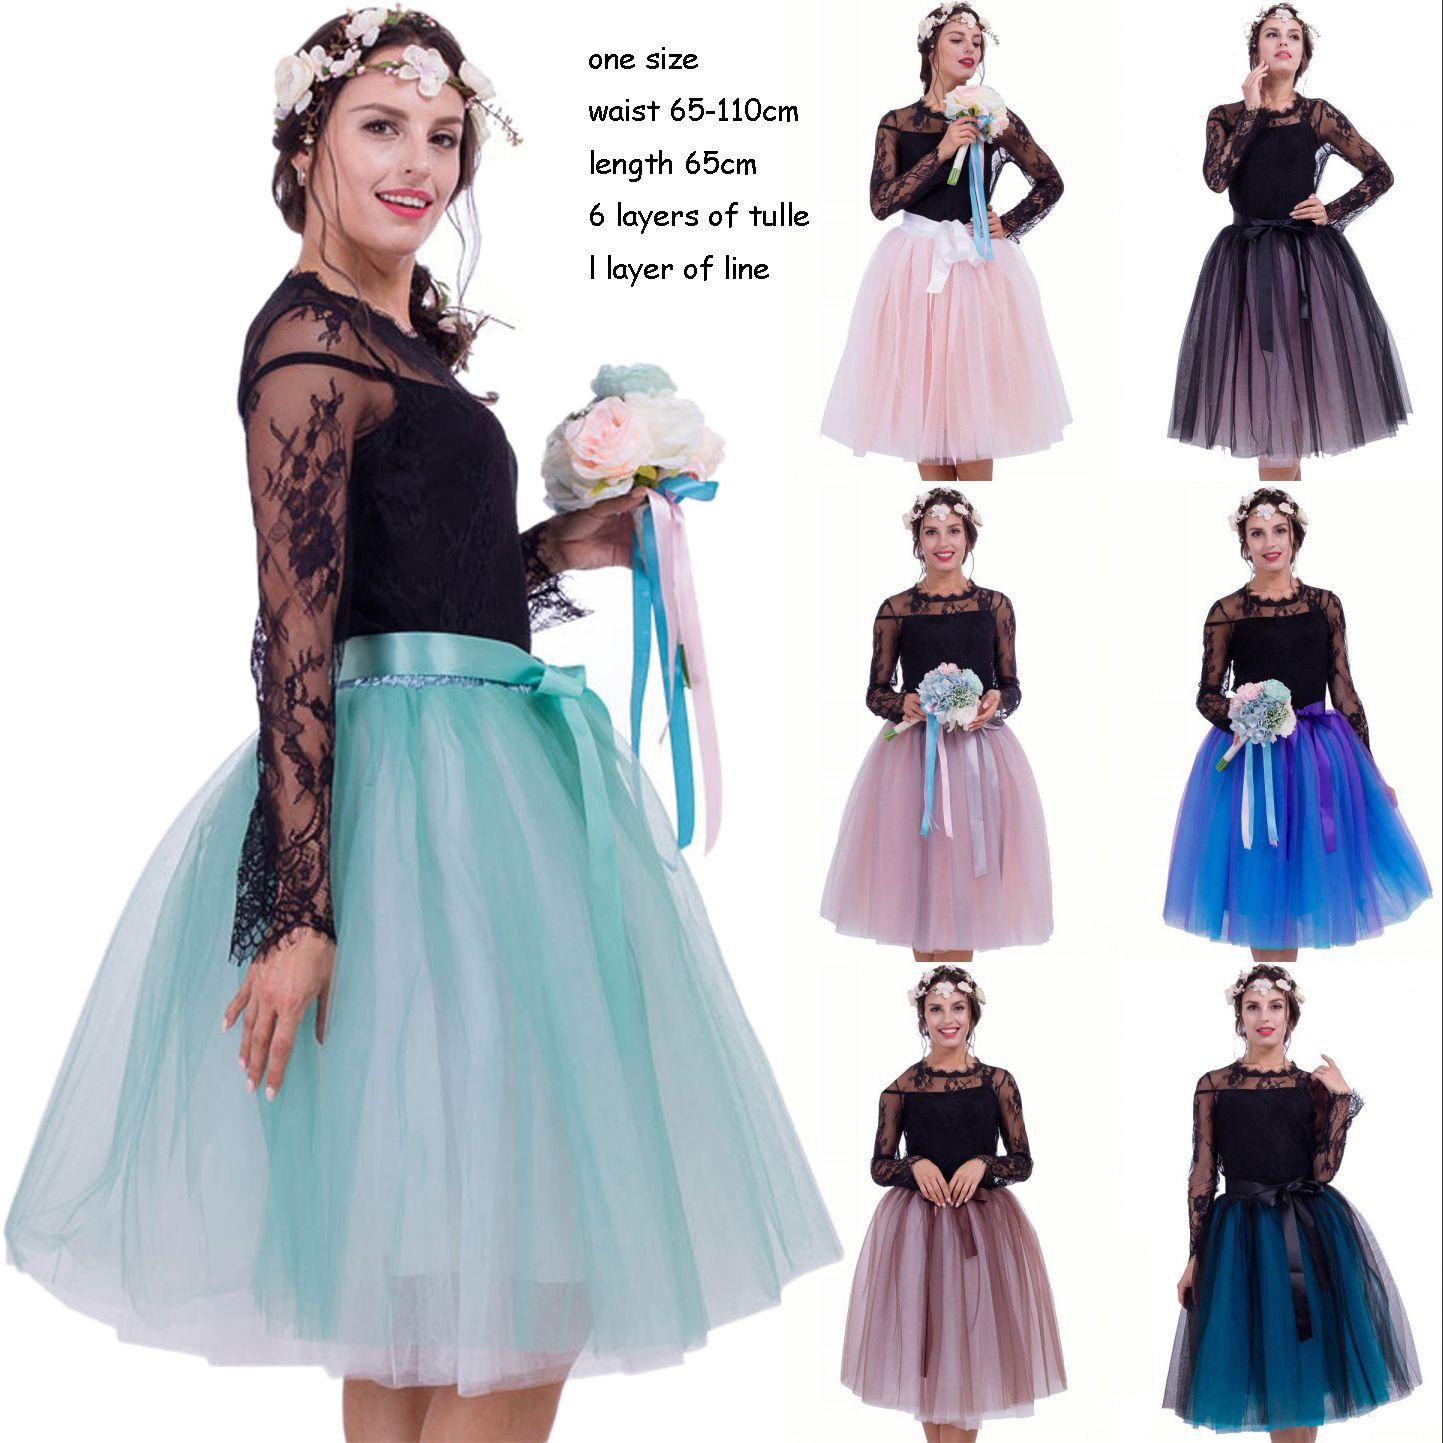 6 Layers Multi Color Tulle Midi Skirt Women Fashion Adult Tutu ...